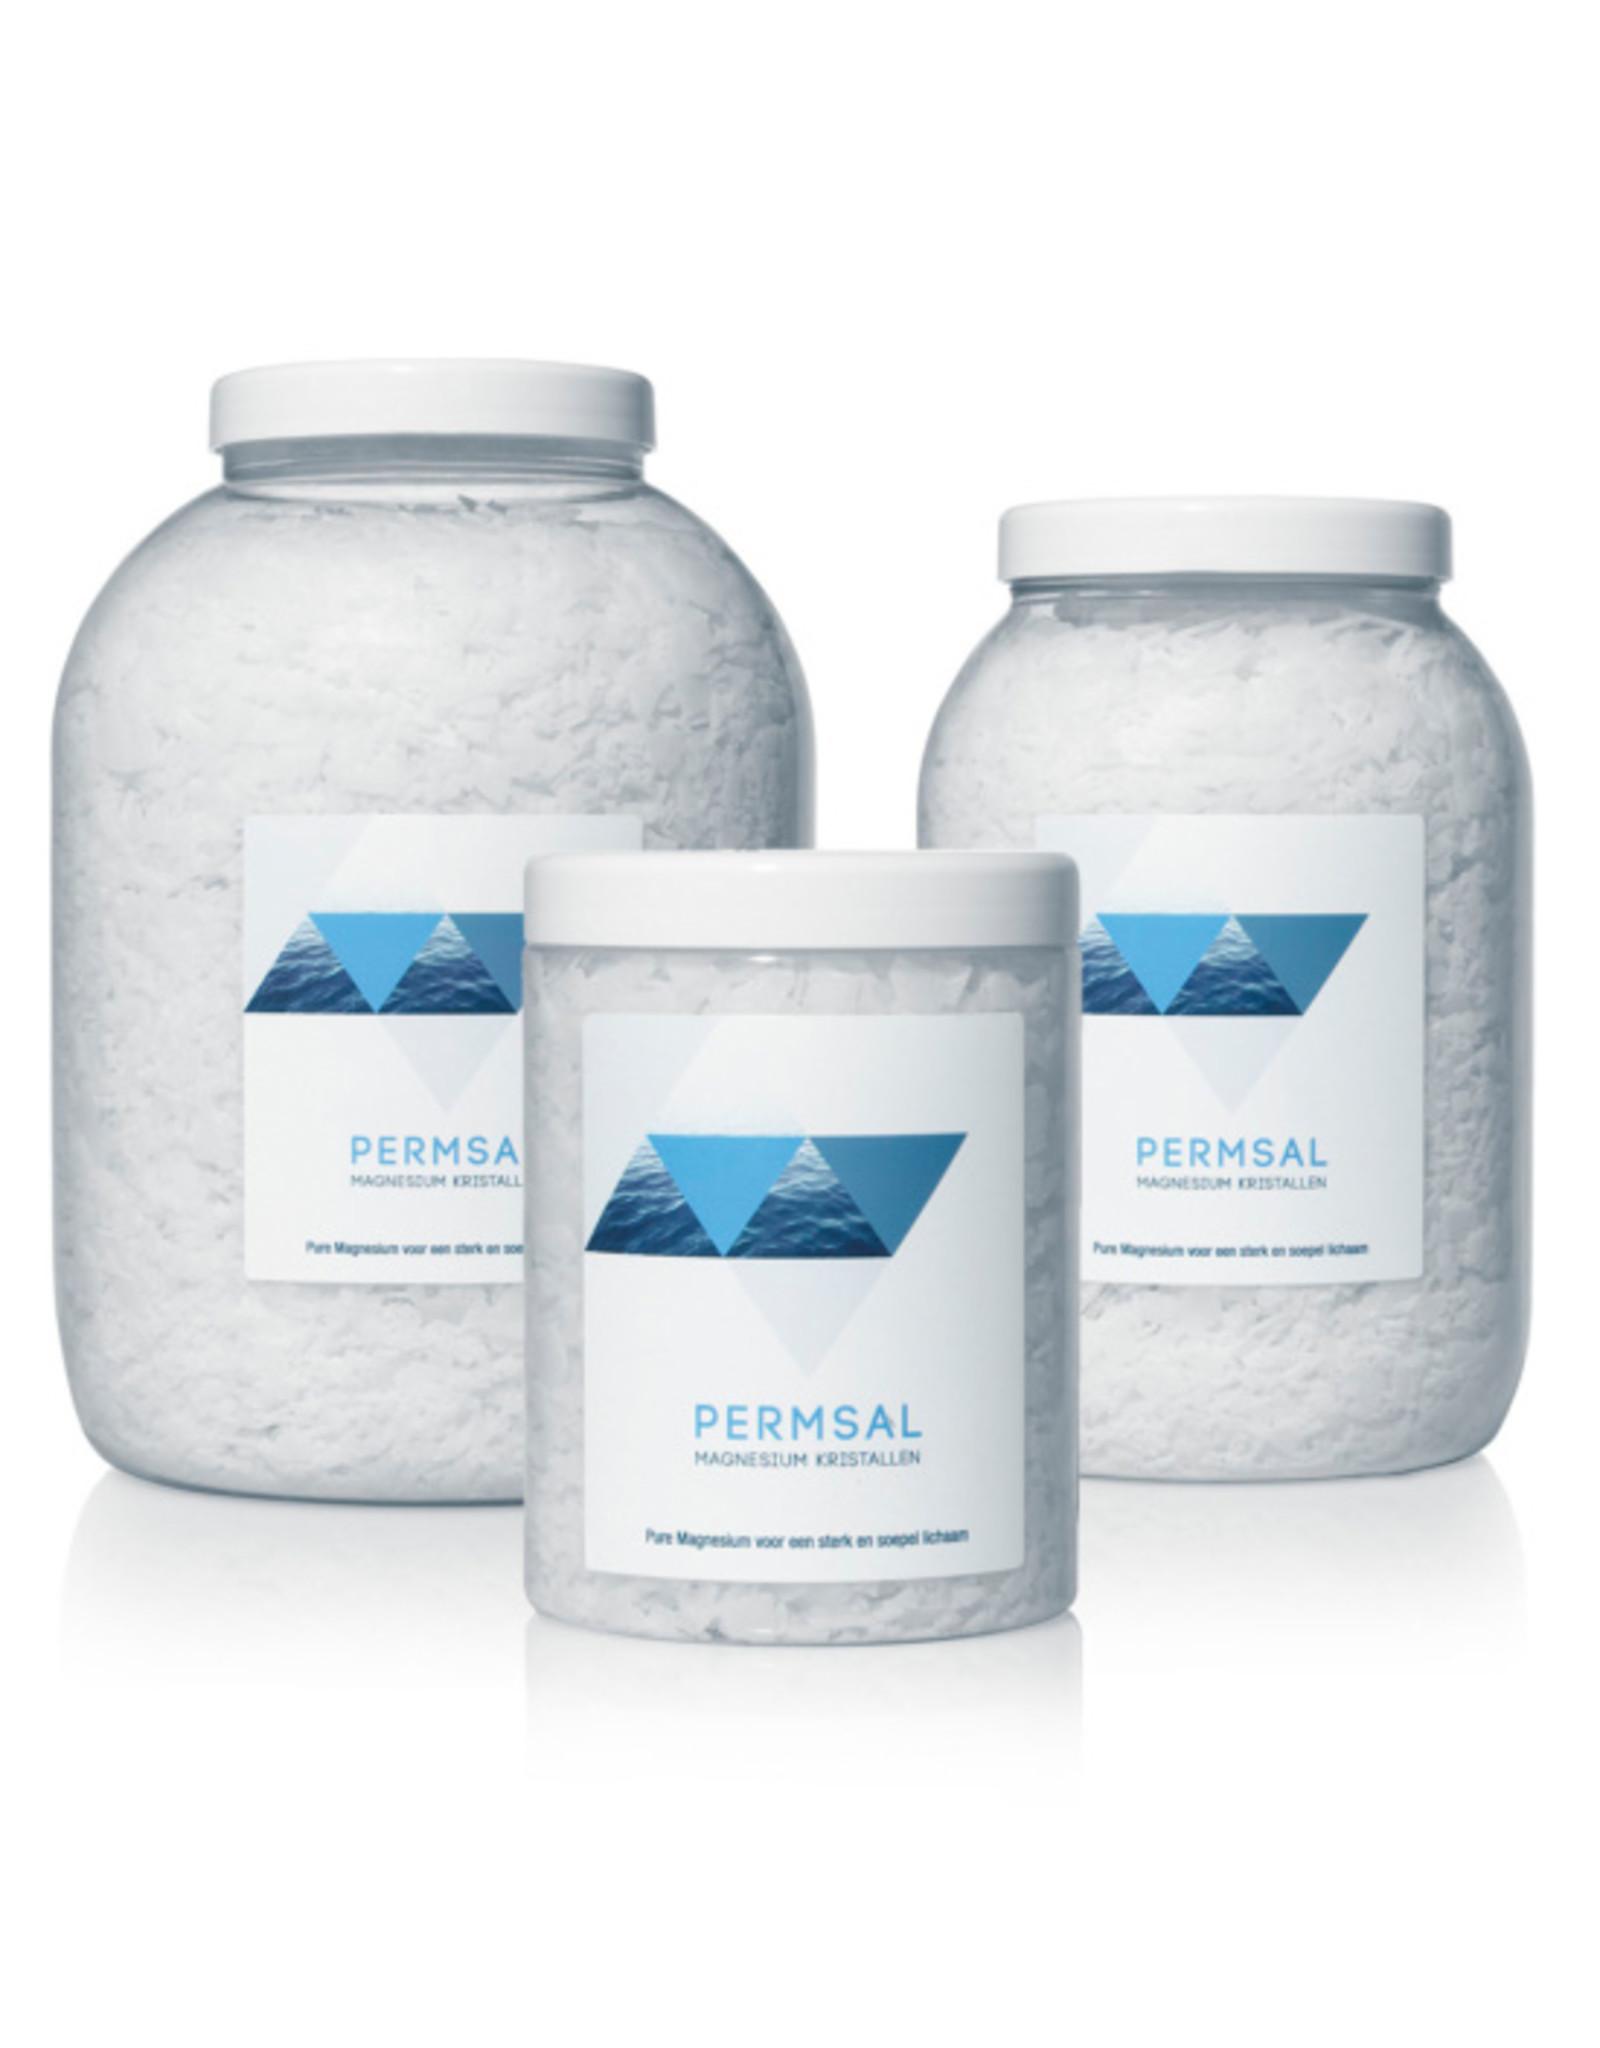 Permsal Magnesium kristallen/vlokken 2 kilo - Body & Soap